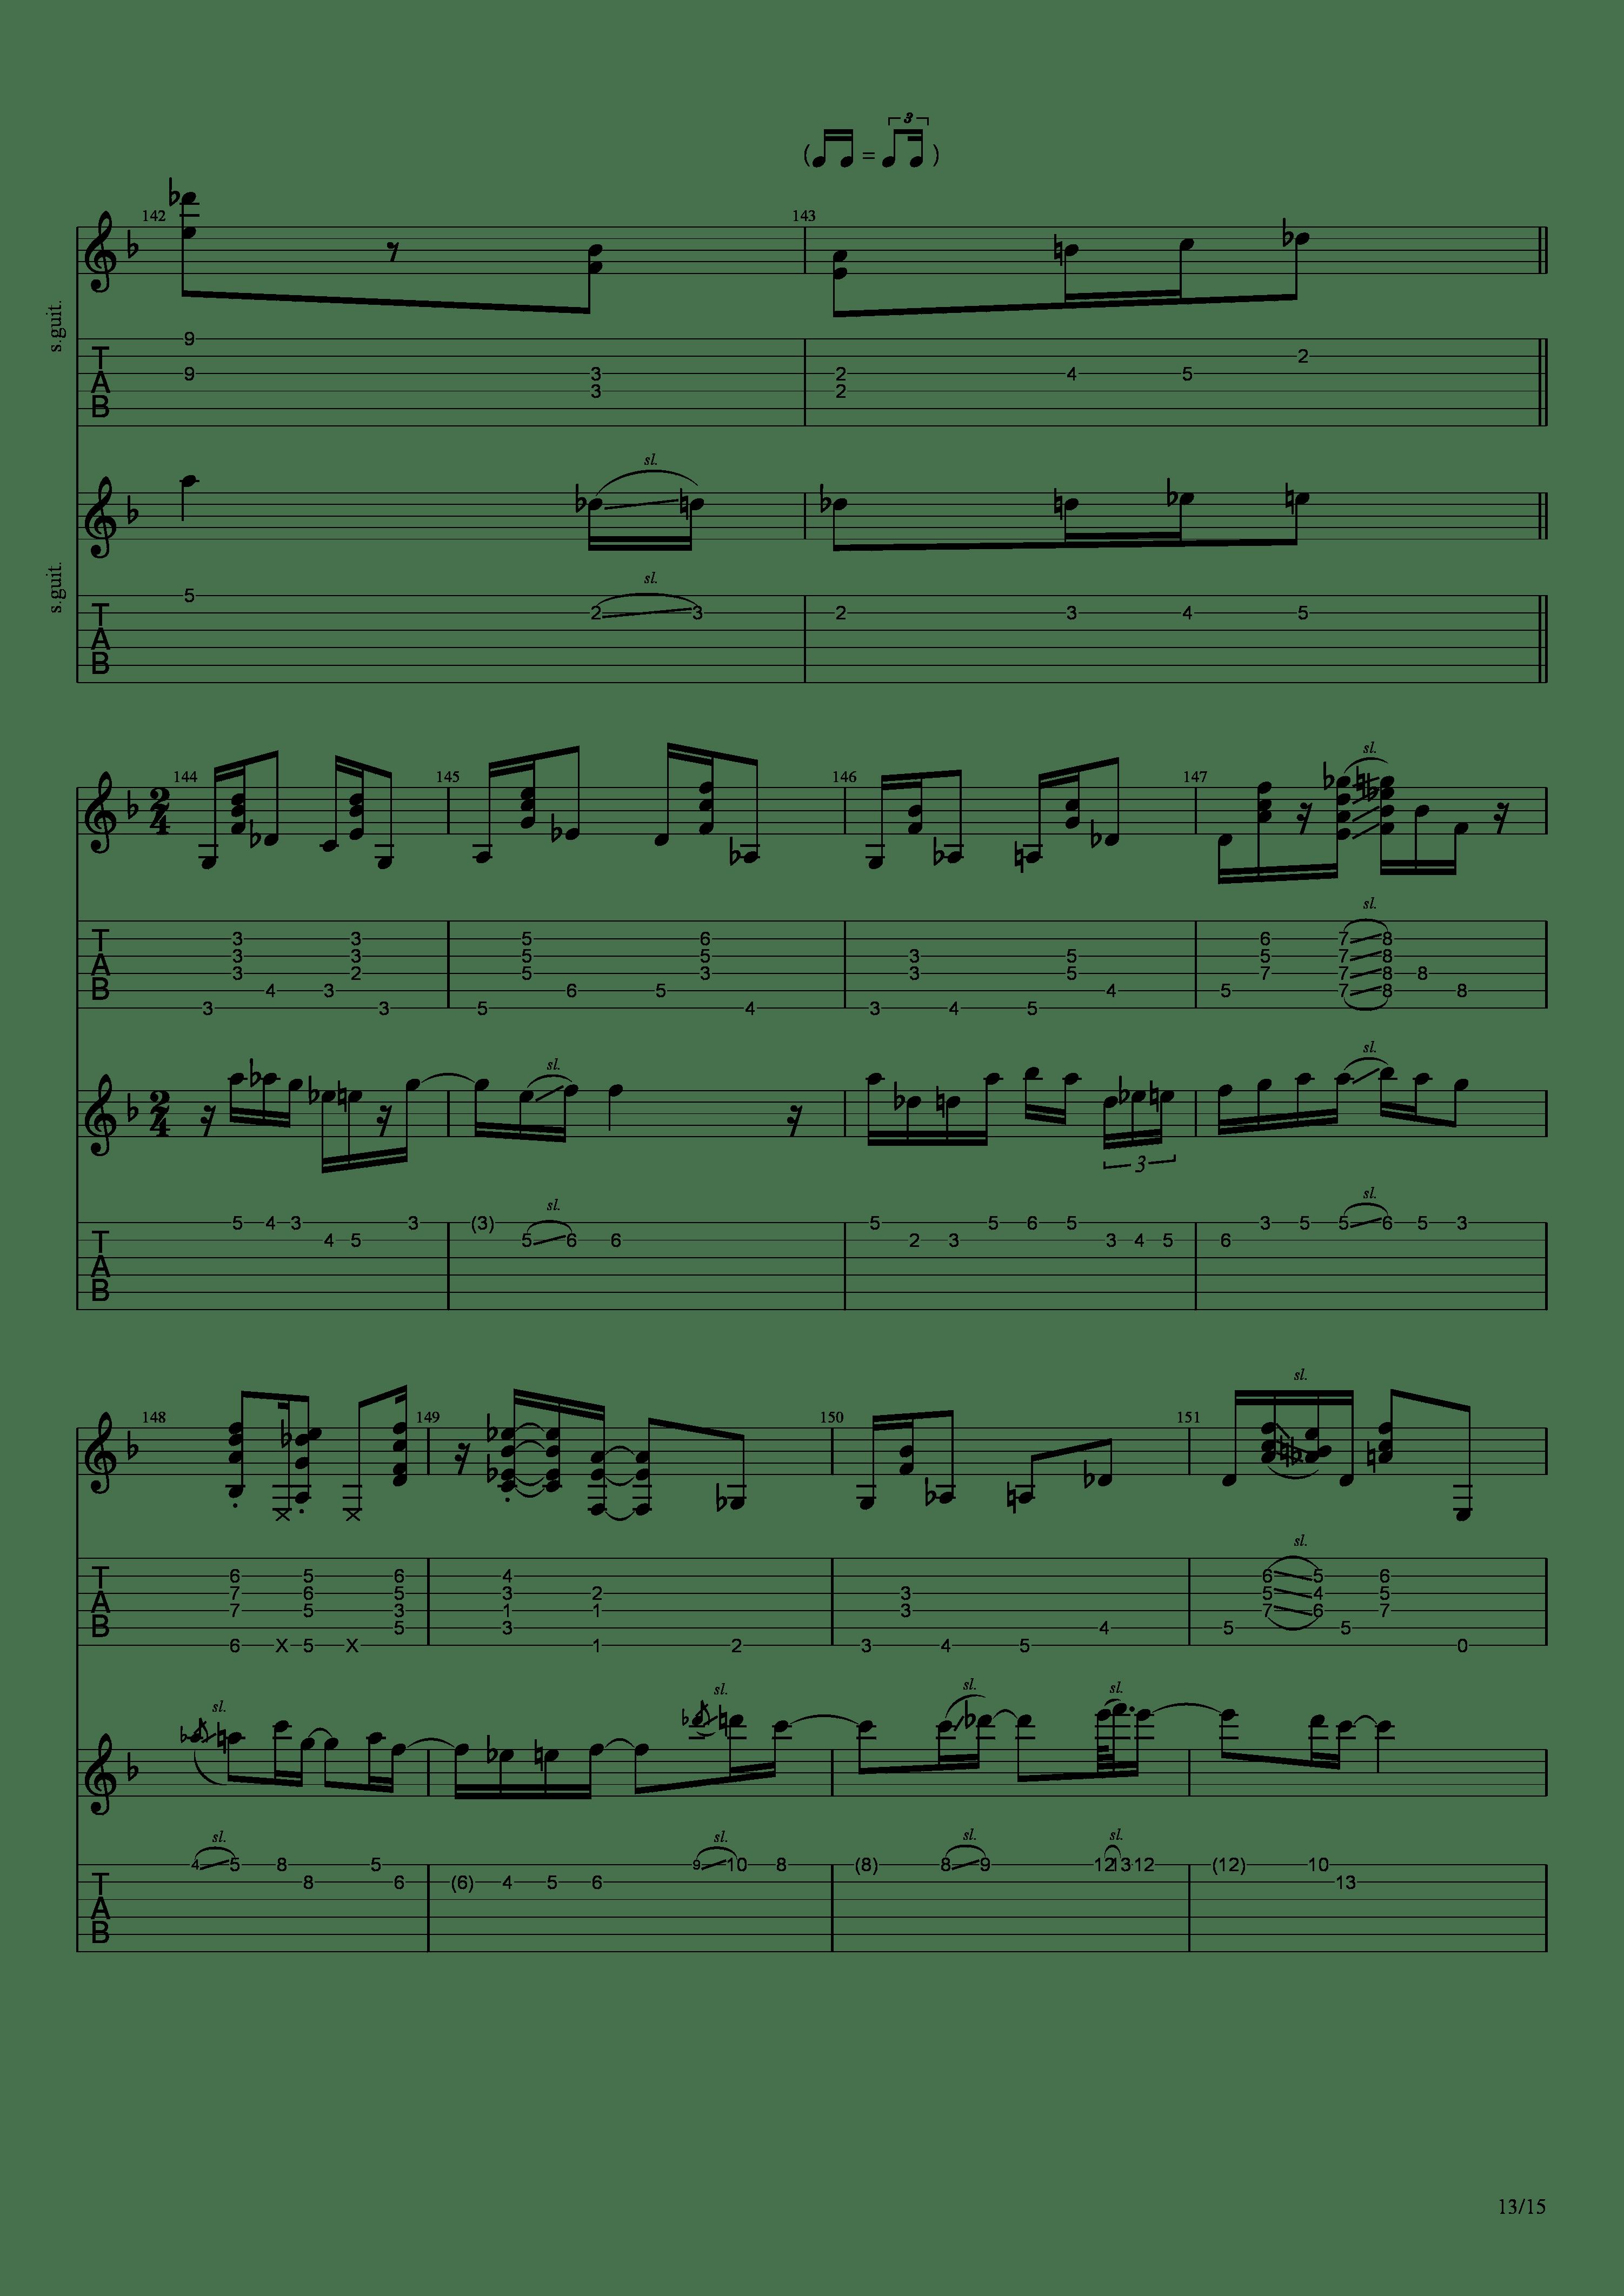 Labyrinth (松井佑贵&井草圣二)吉他谱13